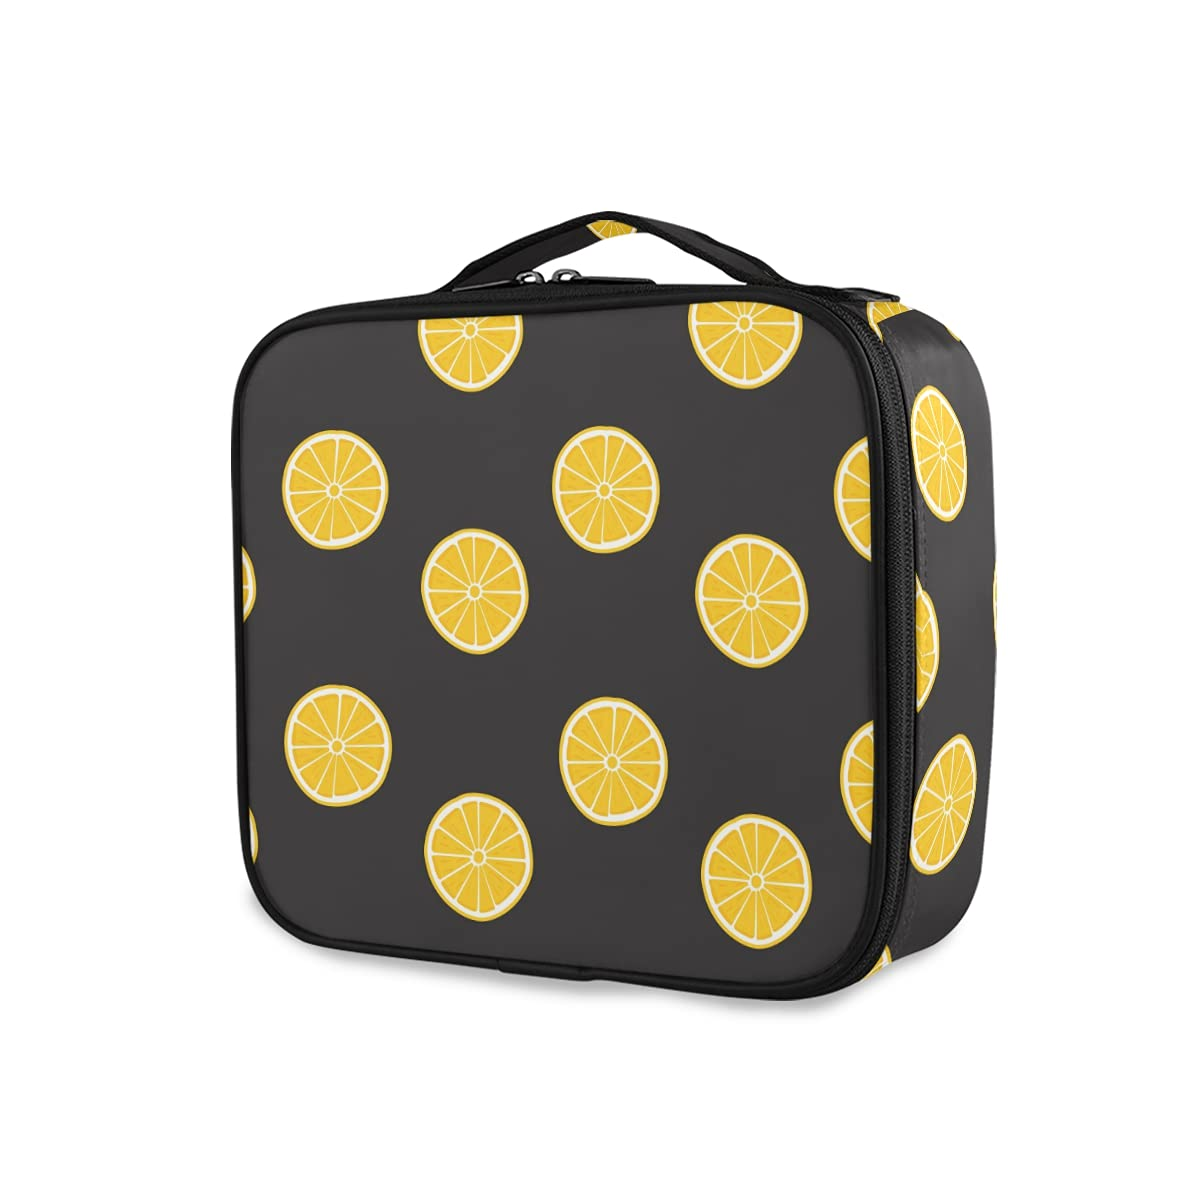 OTVEE Yellow Max 87% OFF Lemon Fruit Pattern Cosmetic Bag Makeup Travel low-pricing